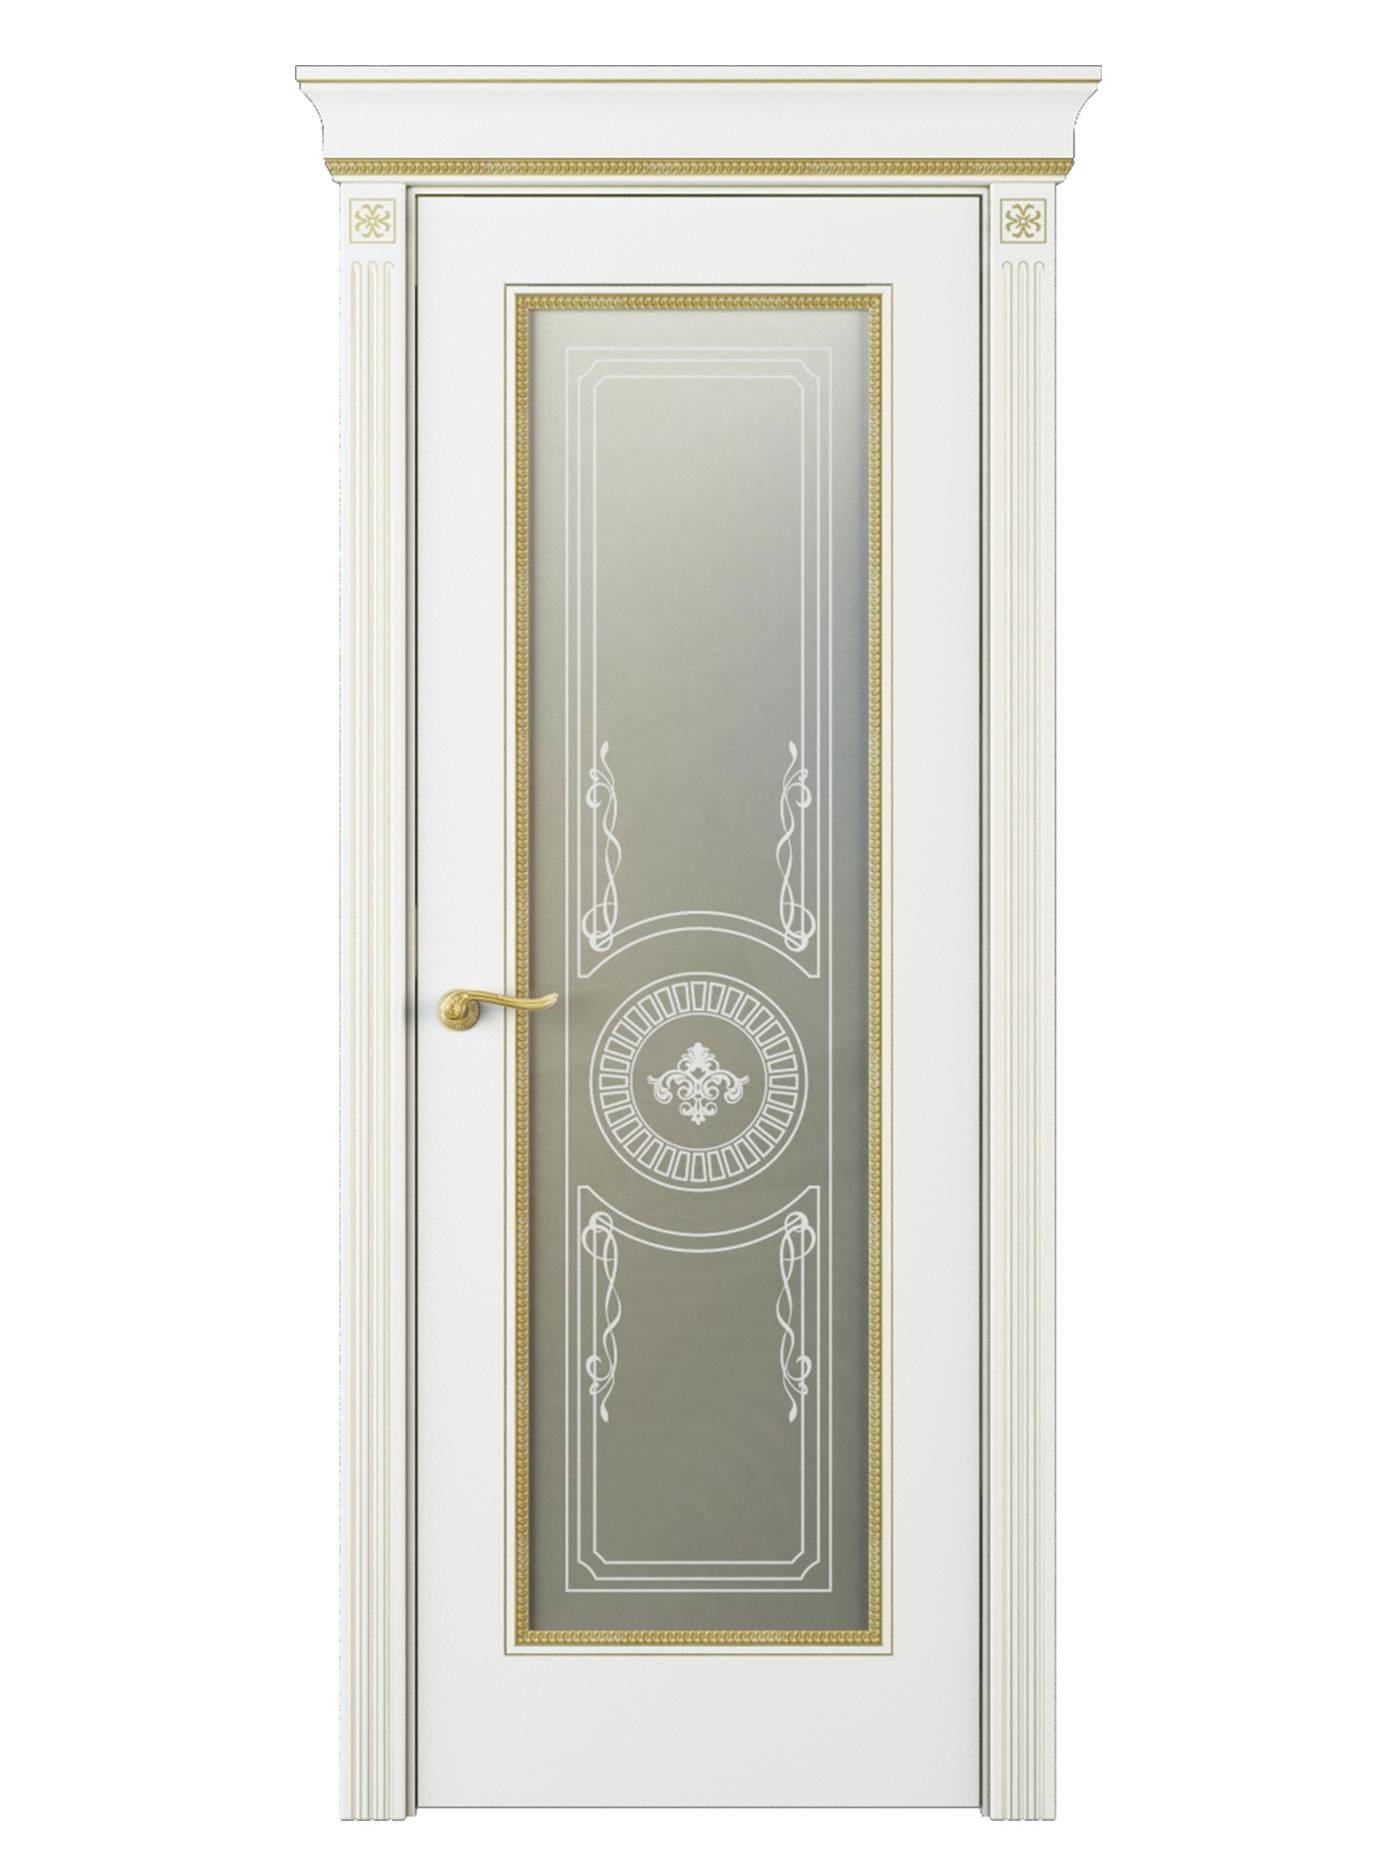 Image Fontanella Vetro Interior Door Italian Enamel White 0